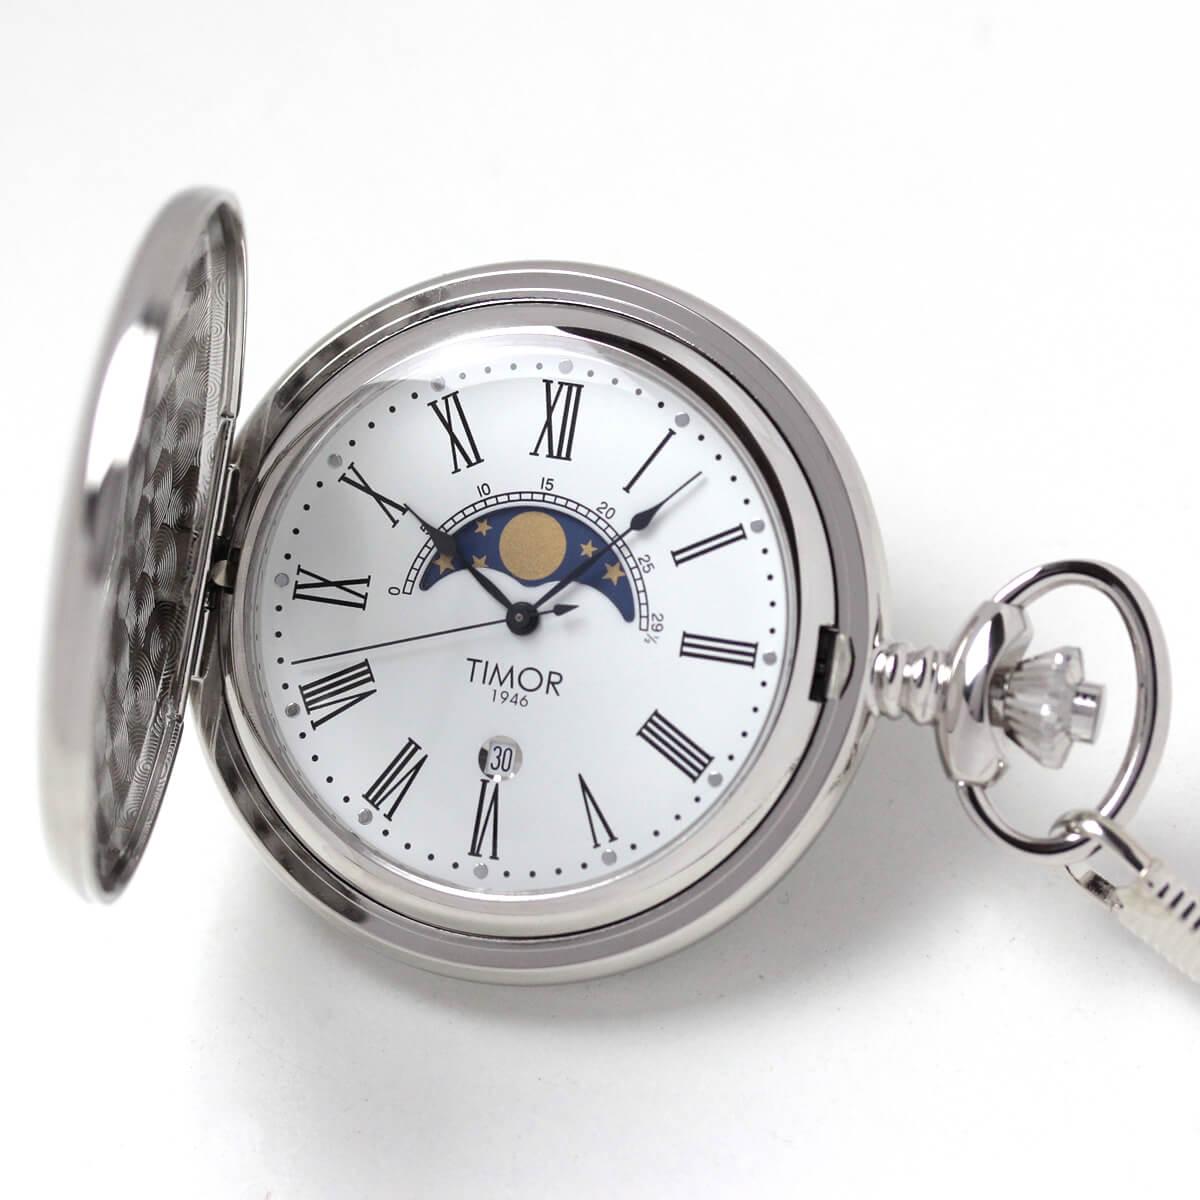 timor(ティモール) 懐中時計 シルバーカラー ムーンフェイズとカレンダー付き